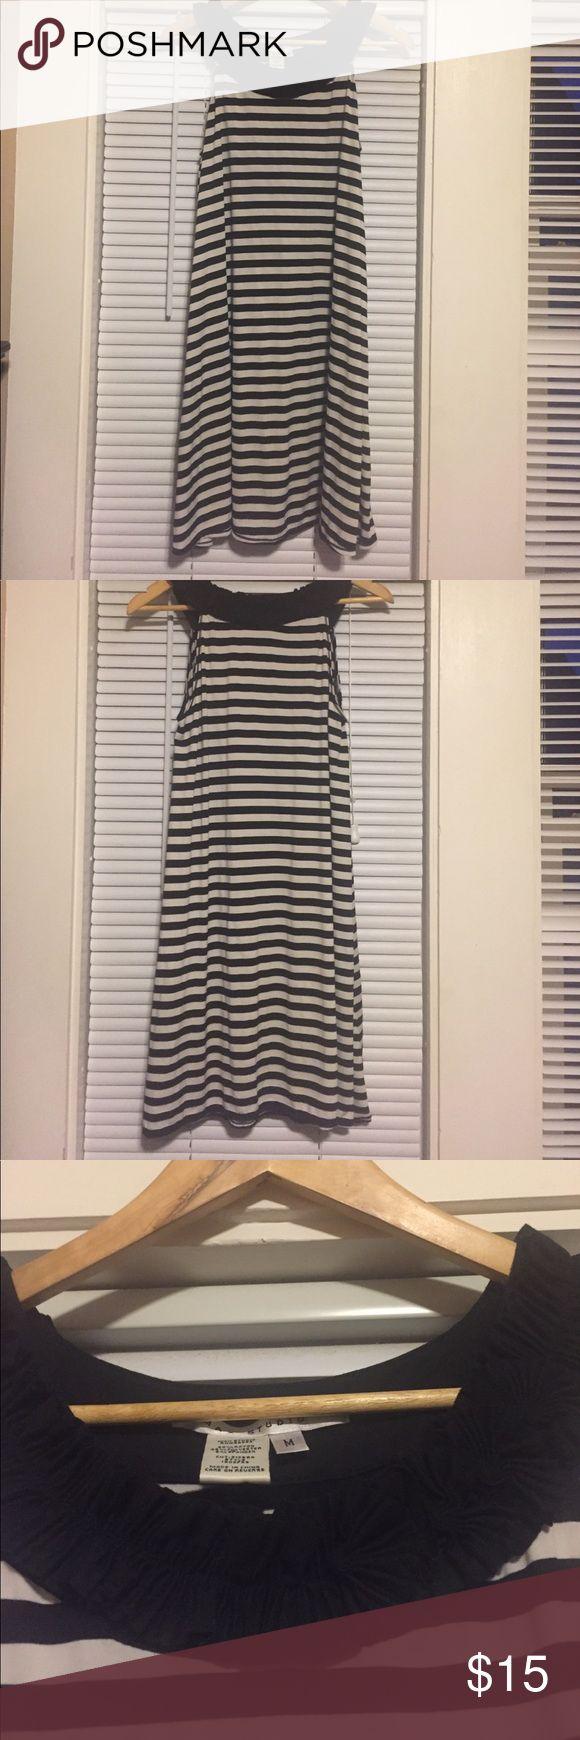 Max Studio Dress /M Max Studio Dress in good condition. Tiny snag shown in last pic. 50% Rayon, 45% Polyester, 5% Spandex. Max Studio Dresses